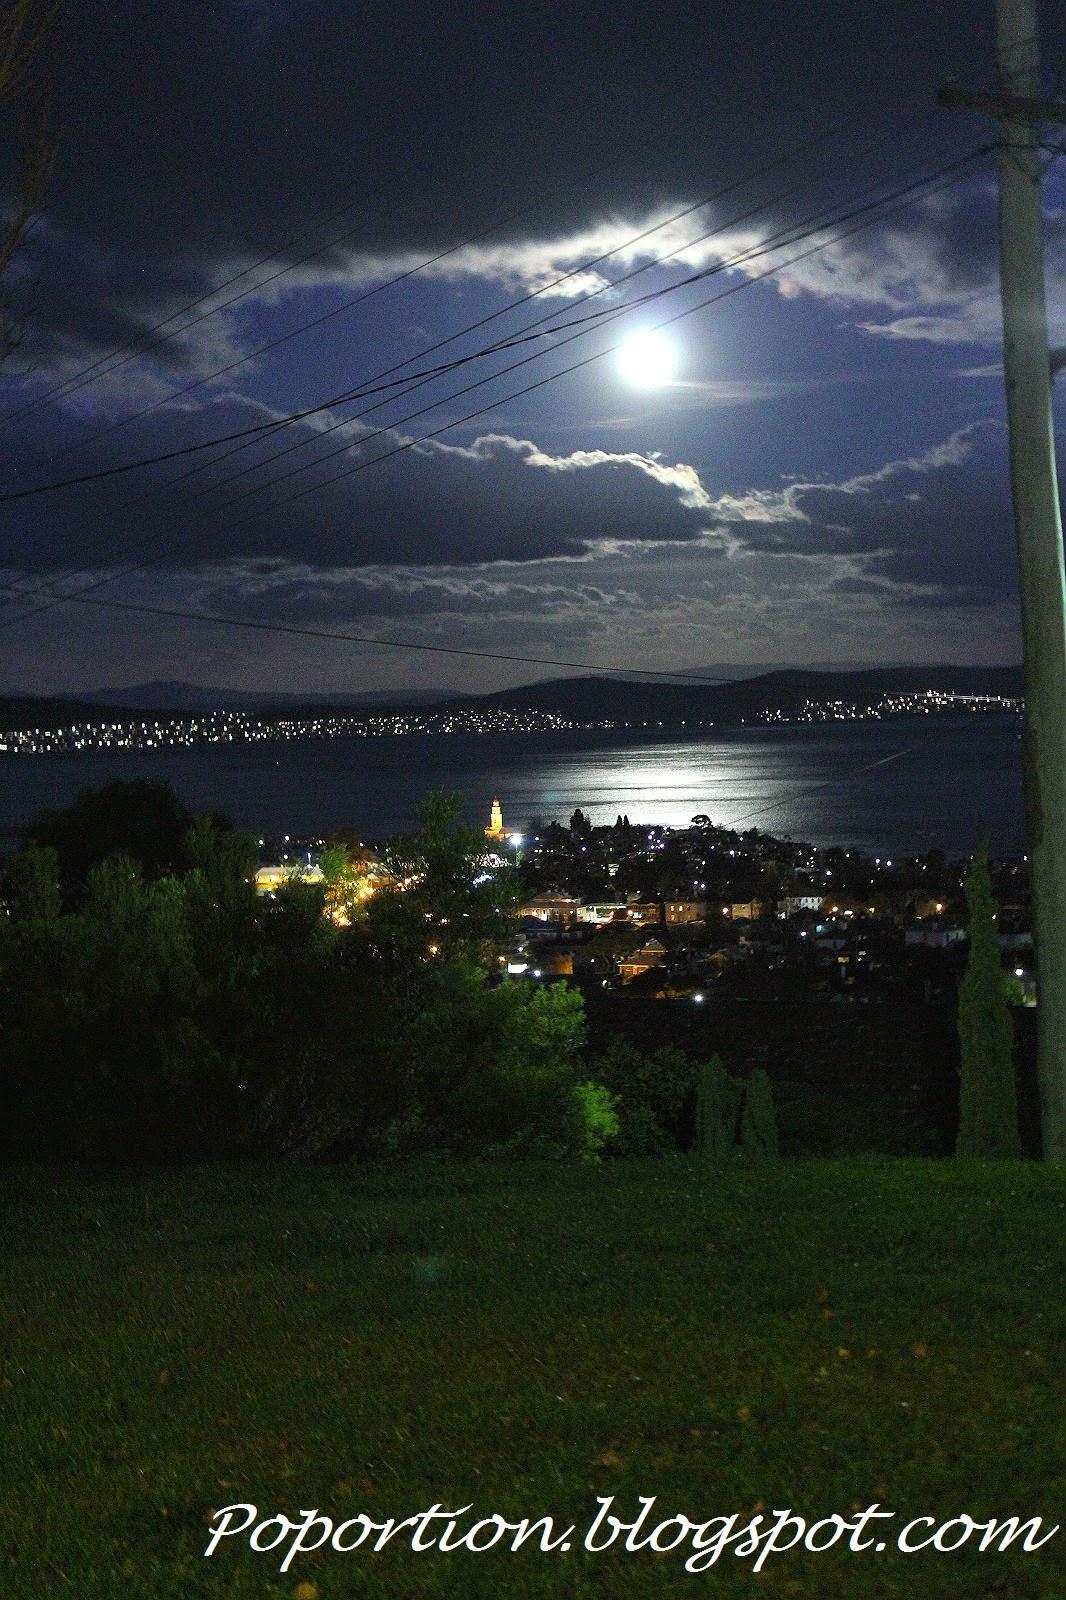 night scenery